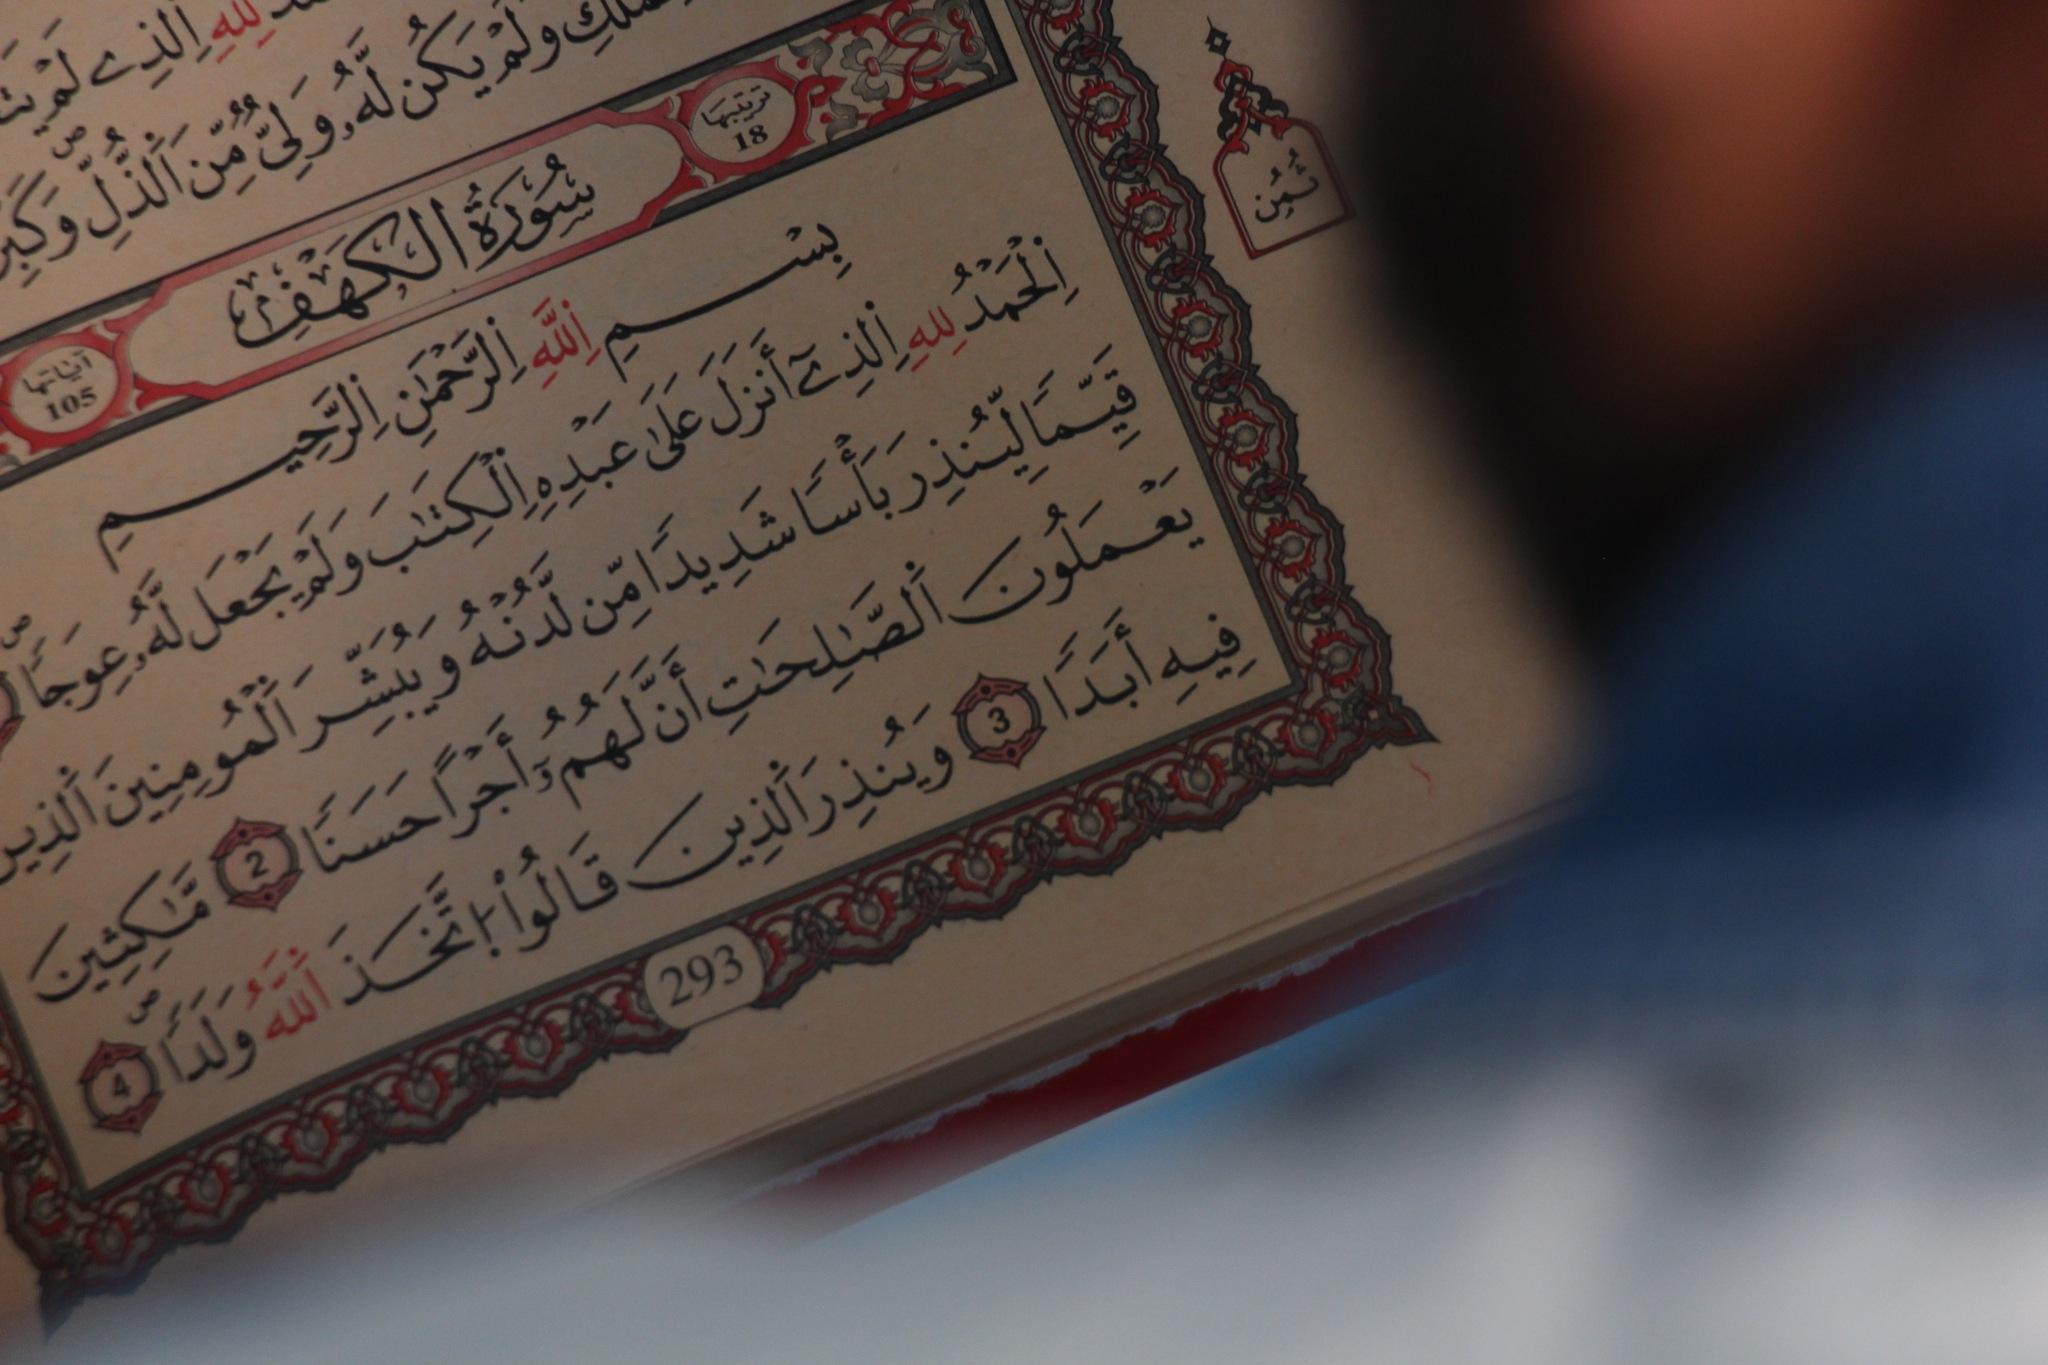 Quran by Mohamed Ben El Bar